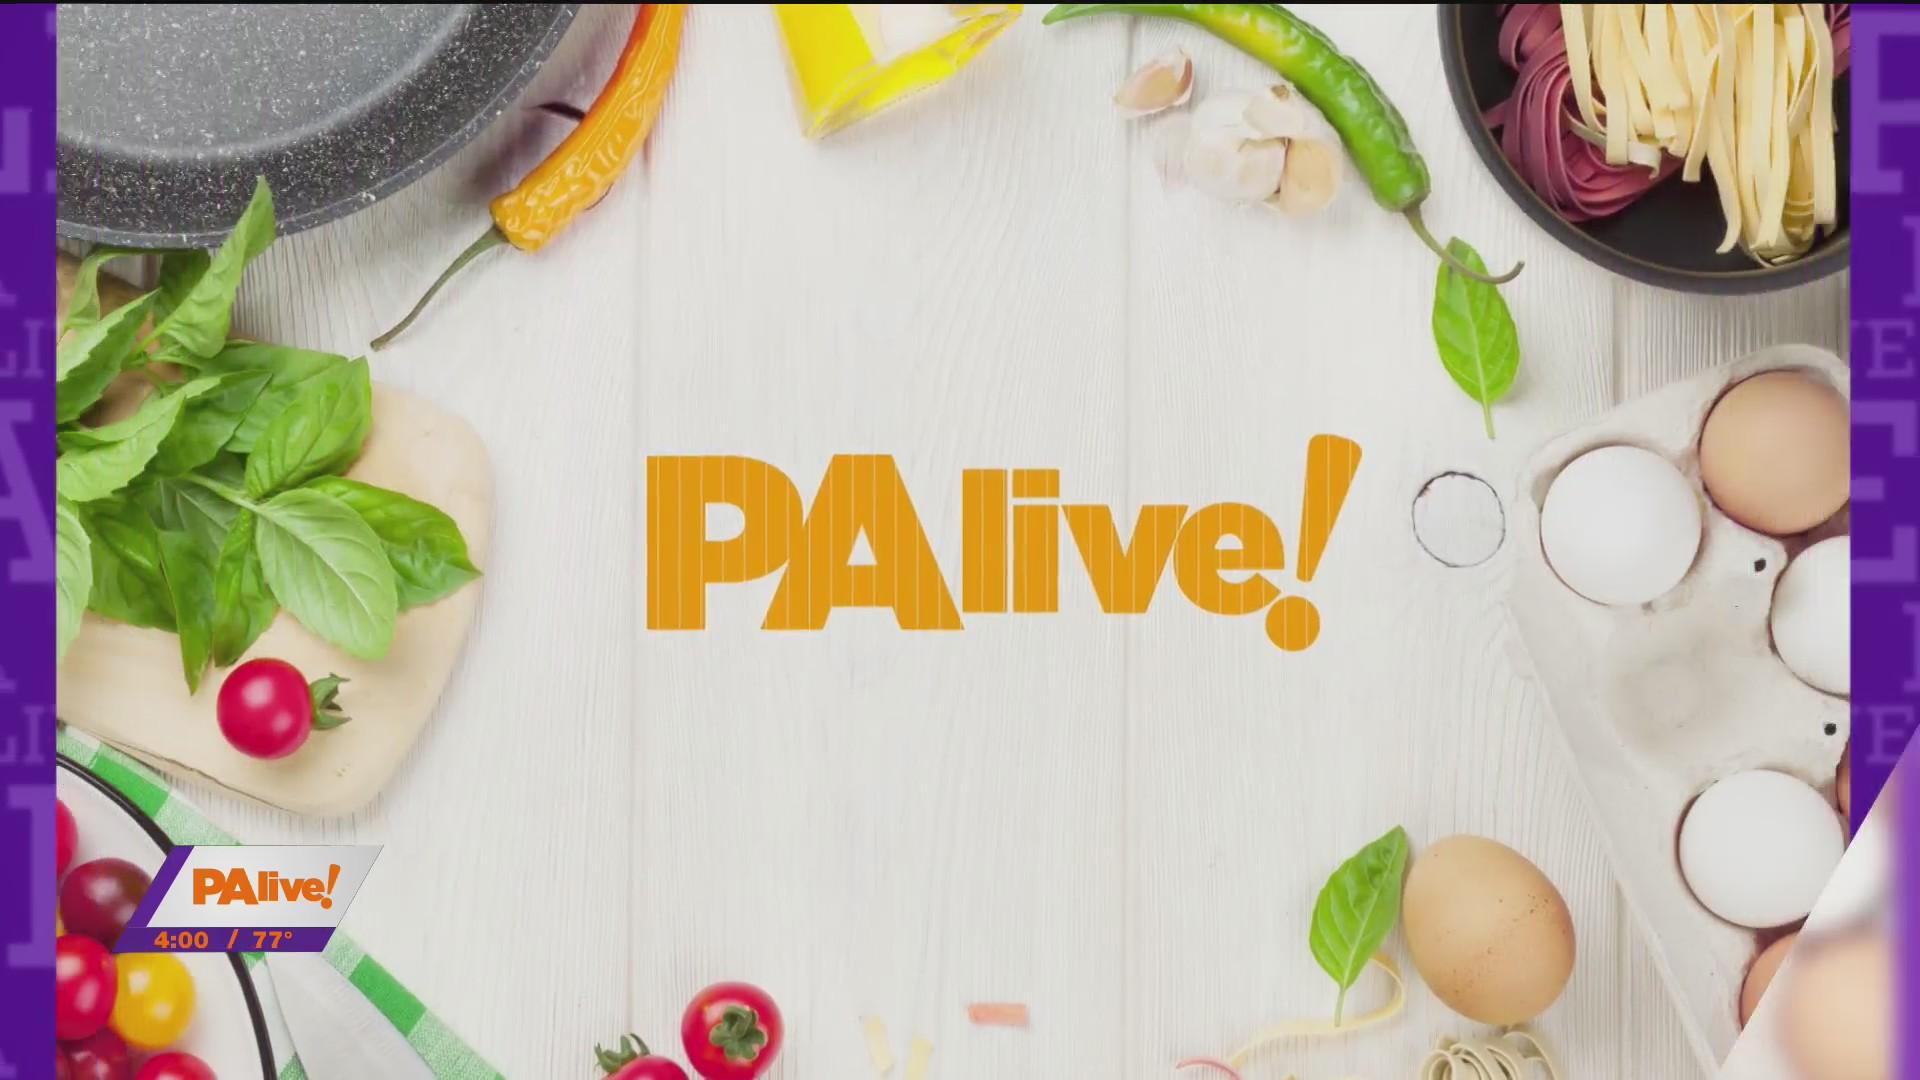 PAlive!